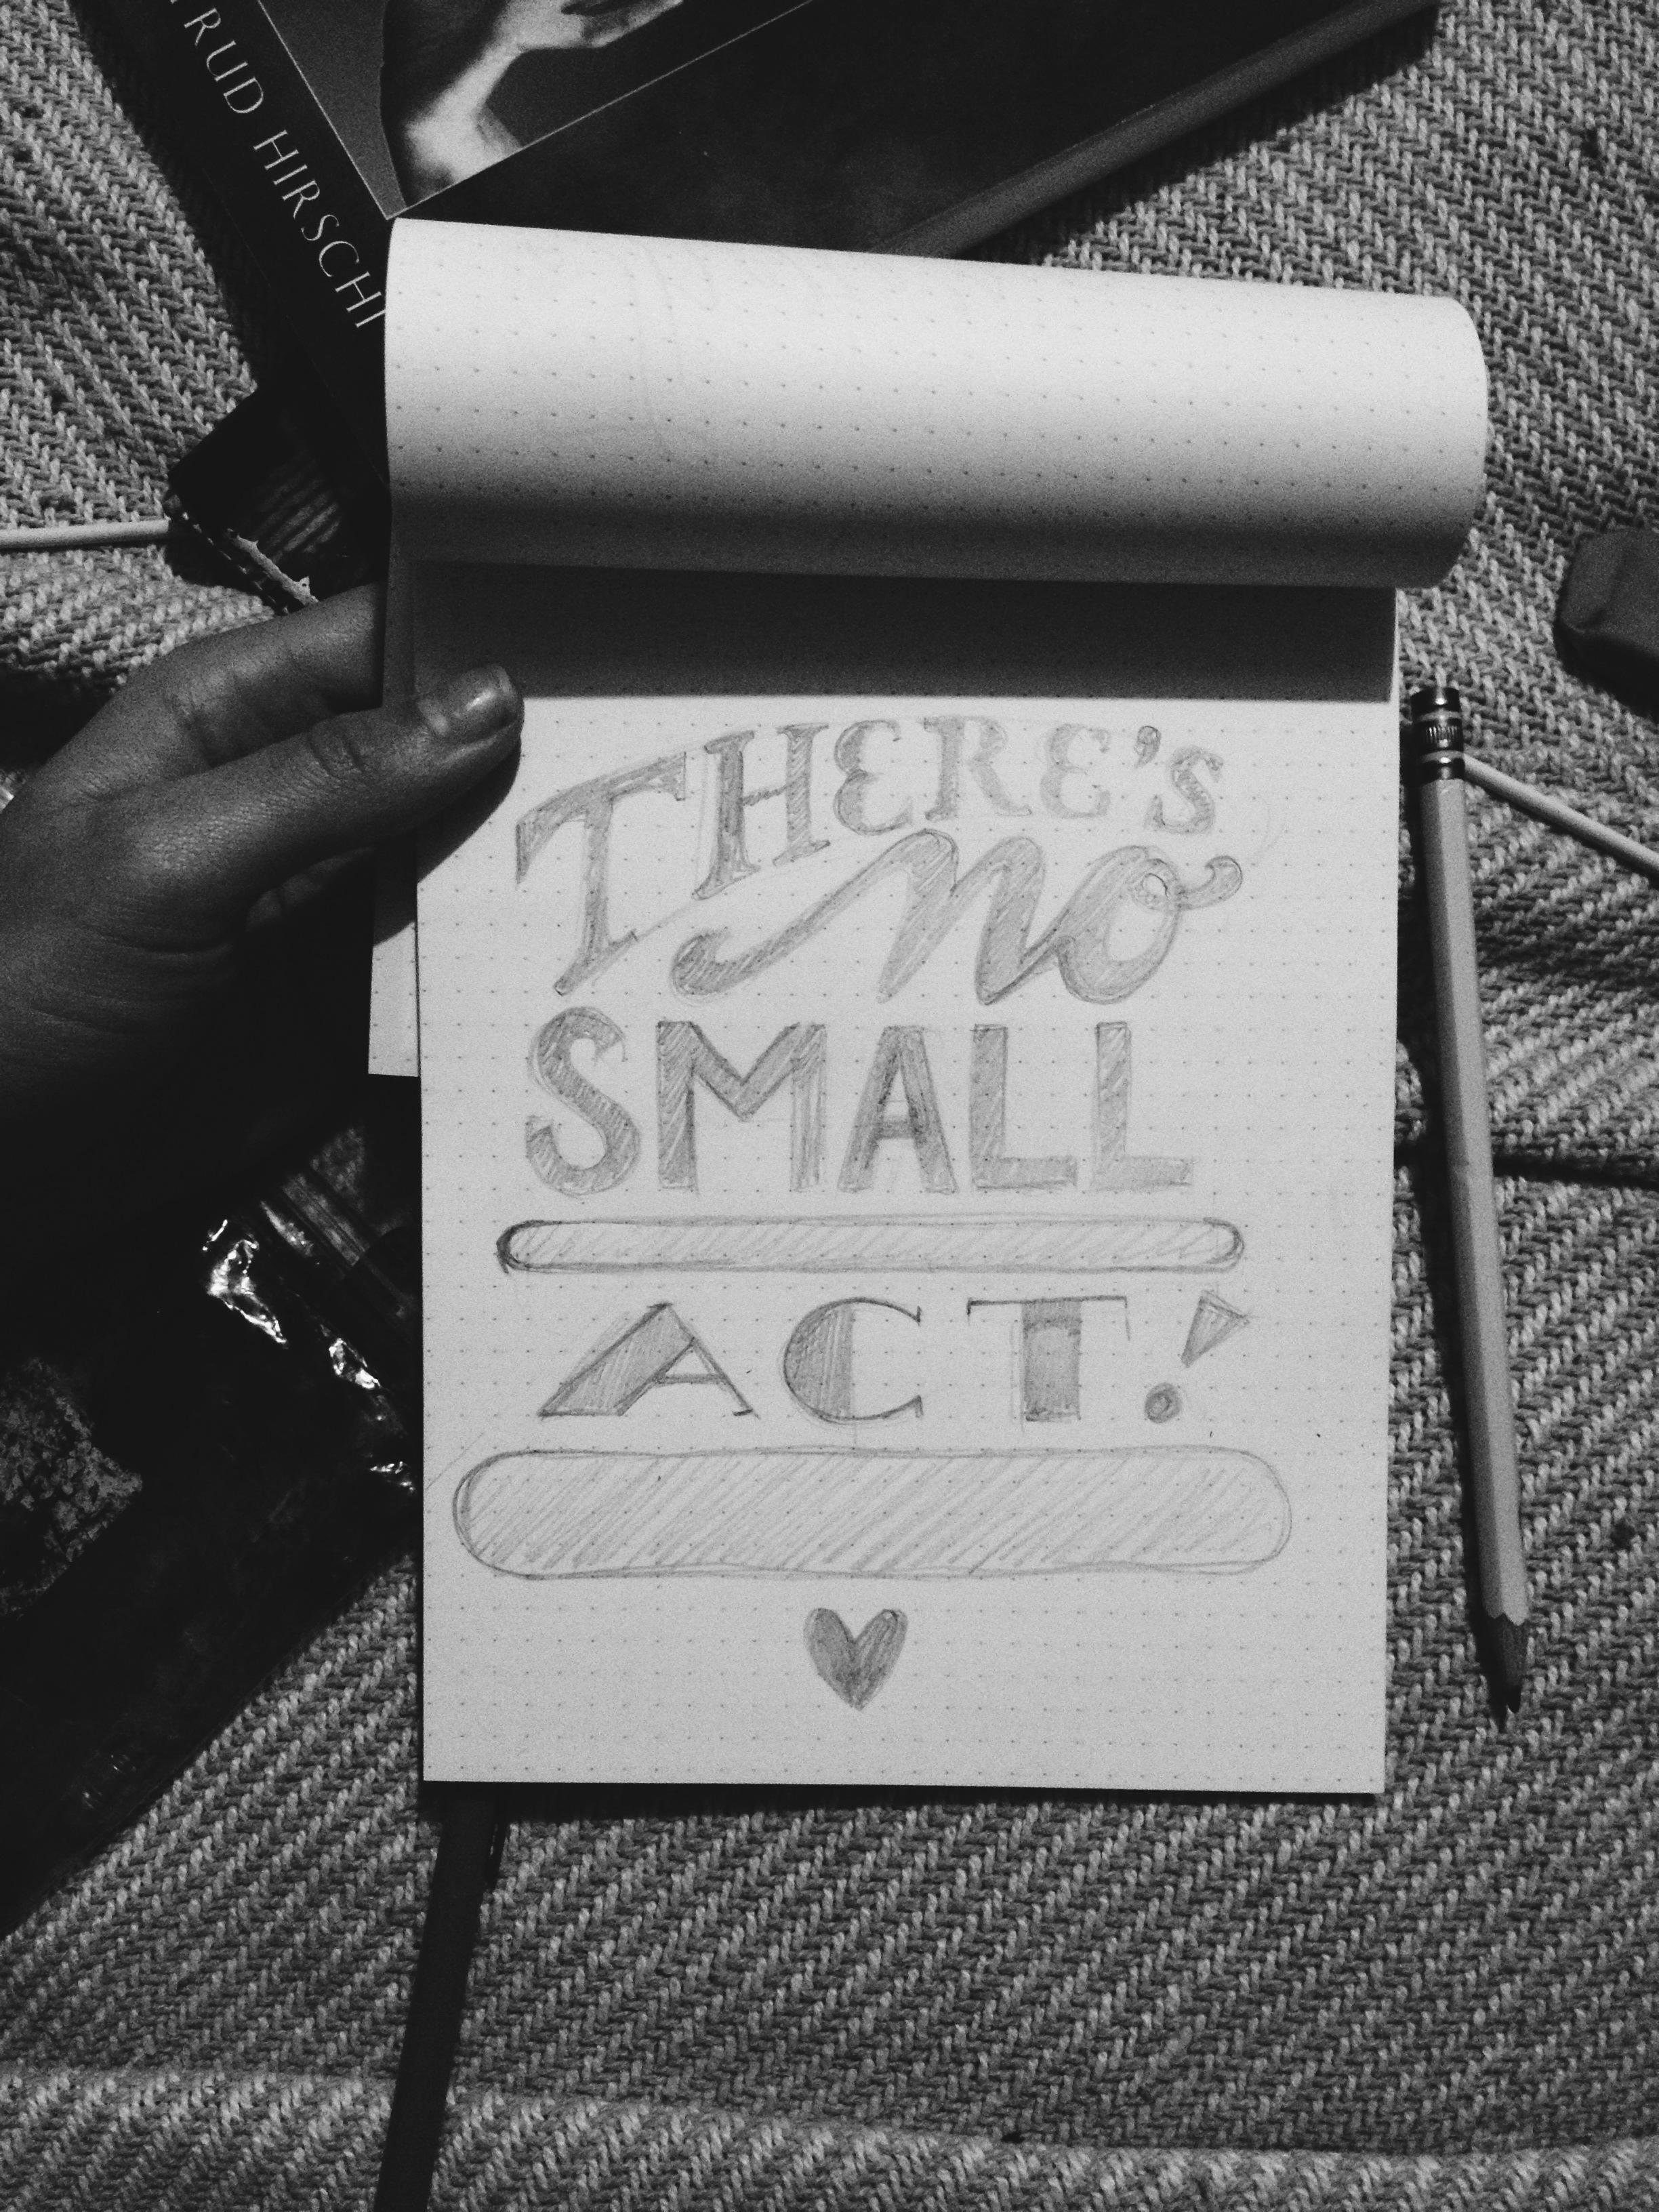 003_Act.jpeg